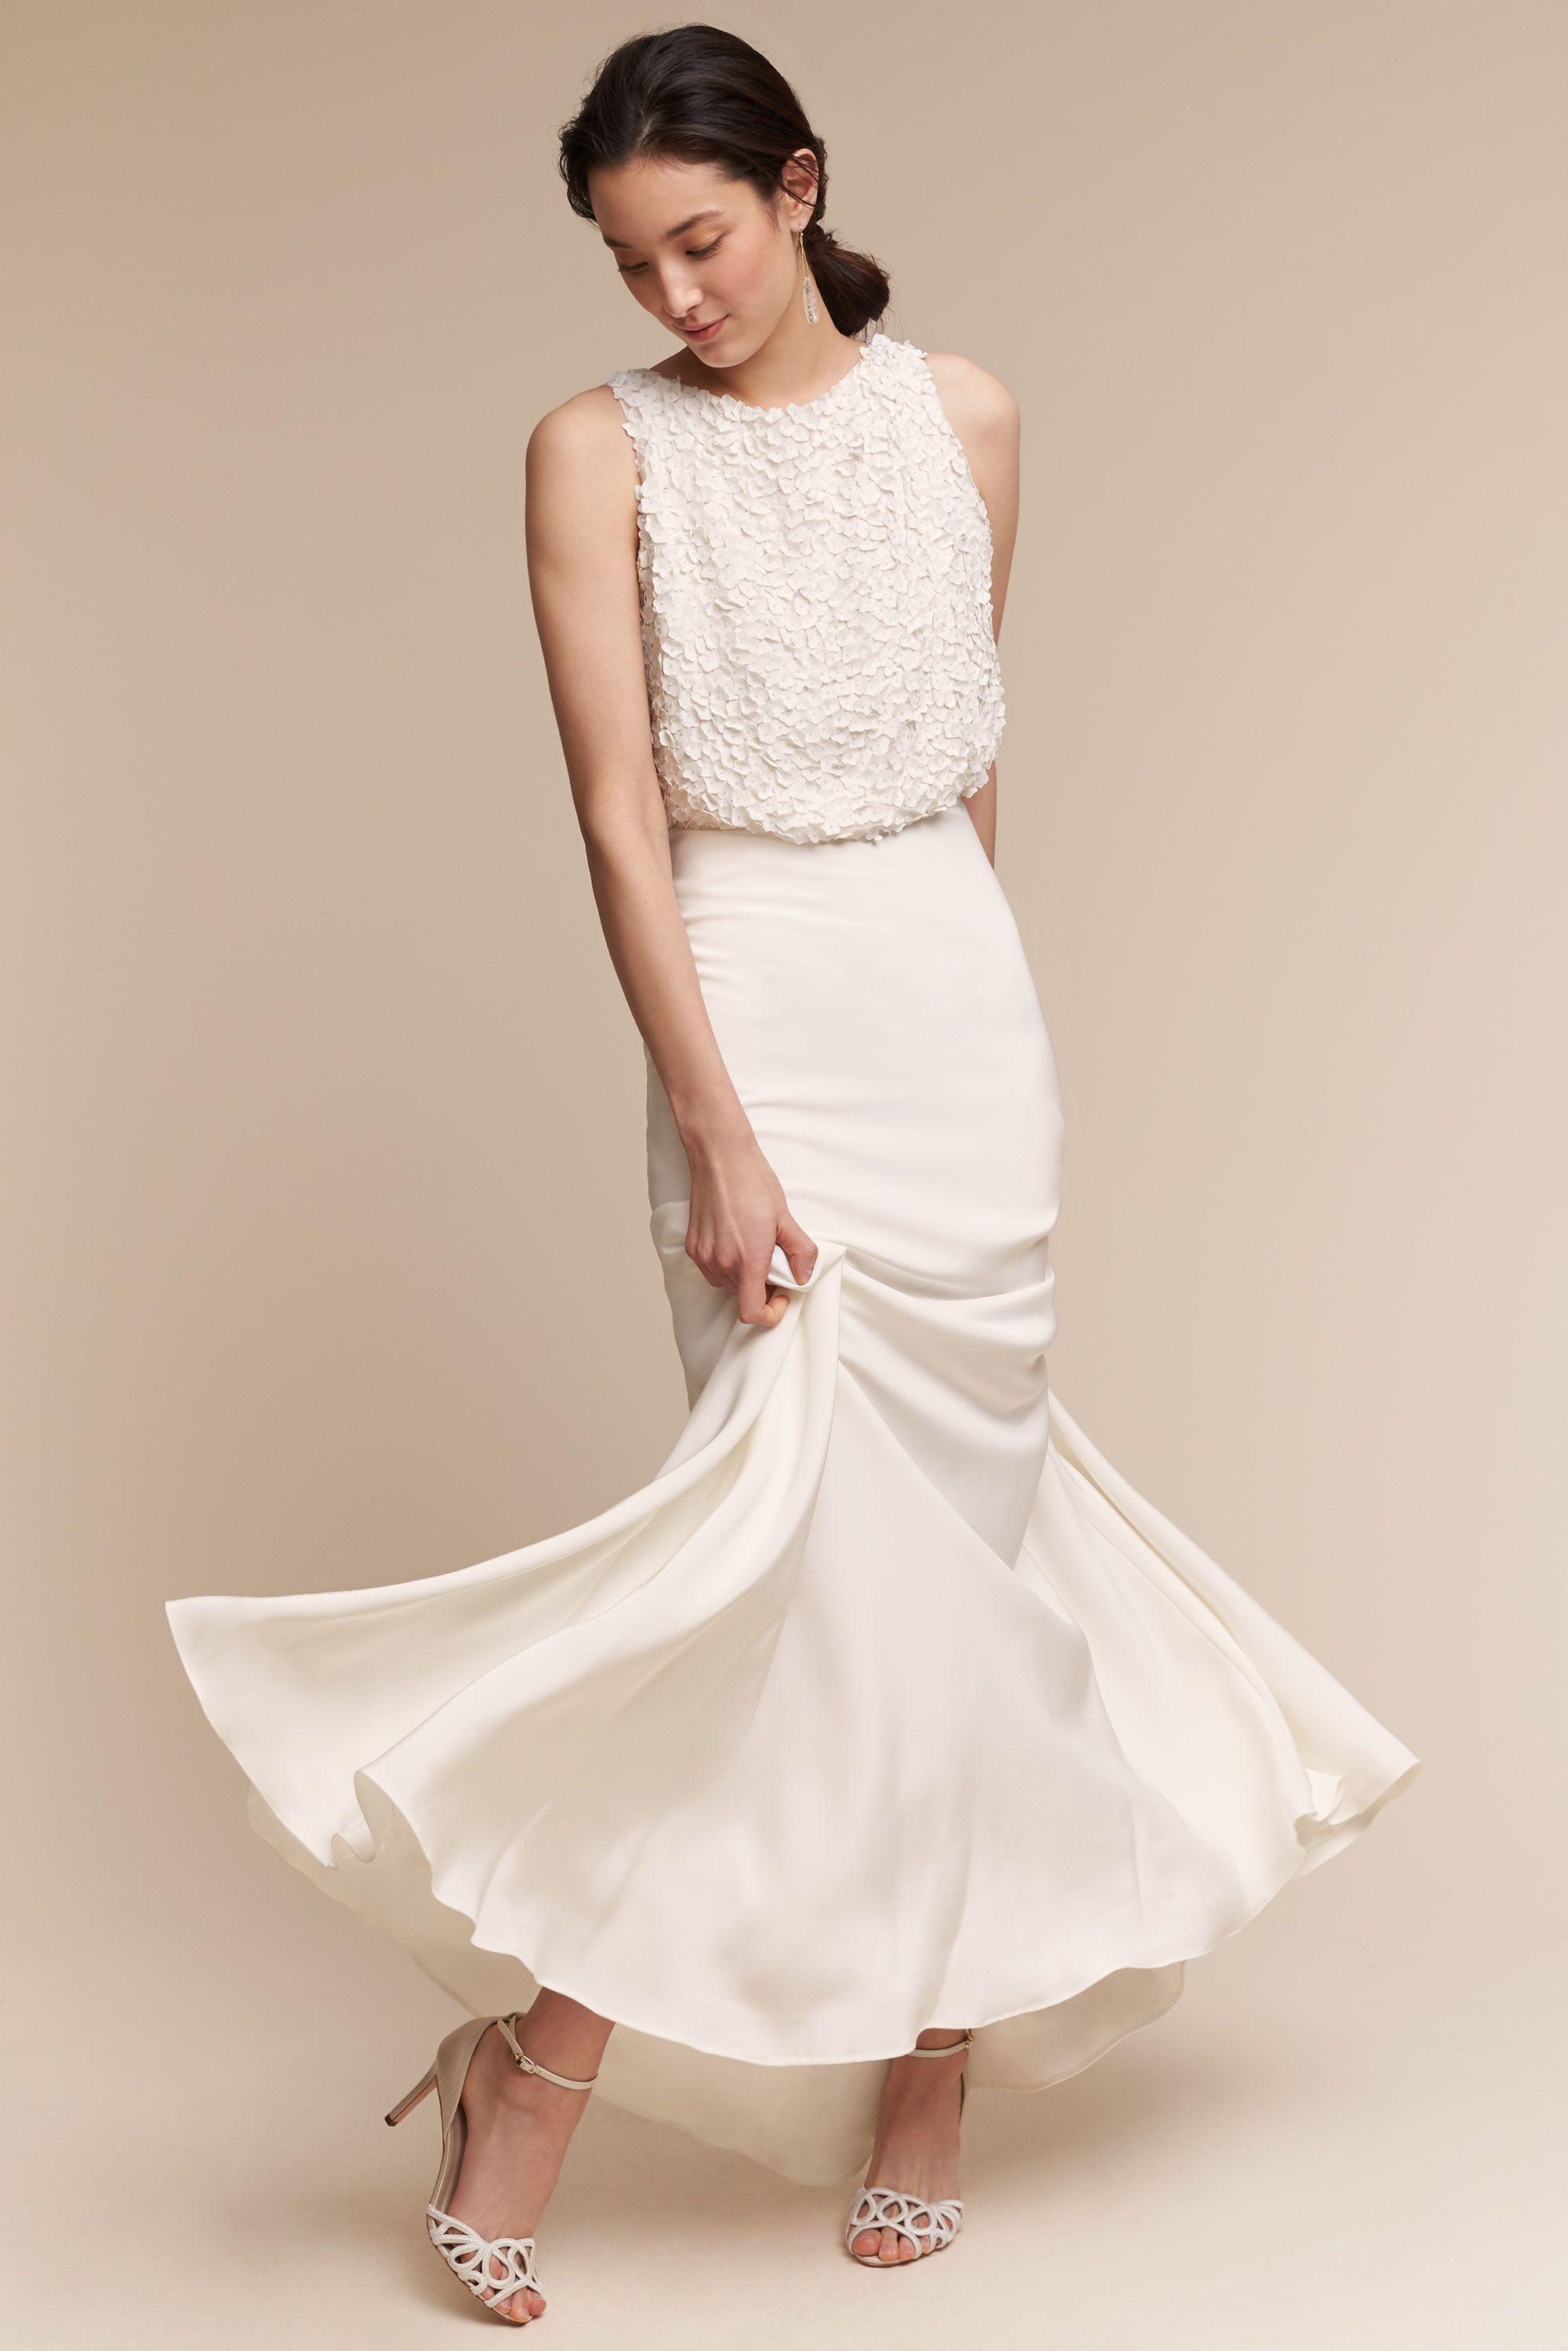 sale wedding dresses wedding dresses for sale Imogene Gown